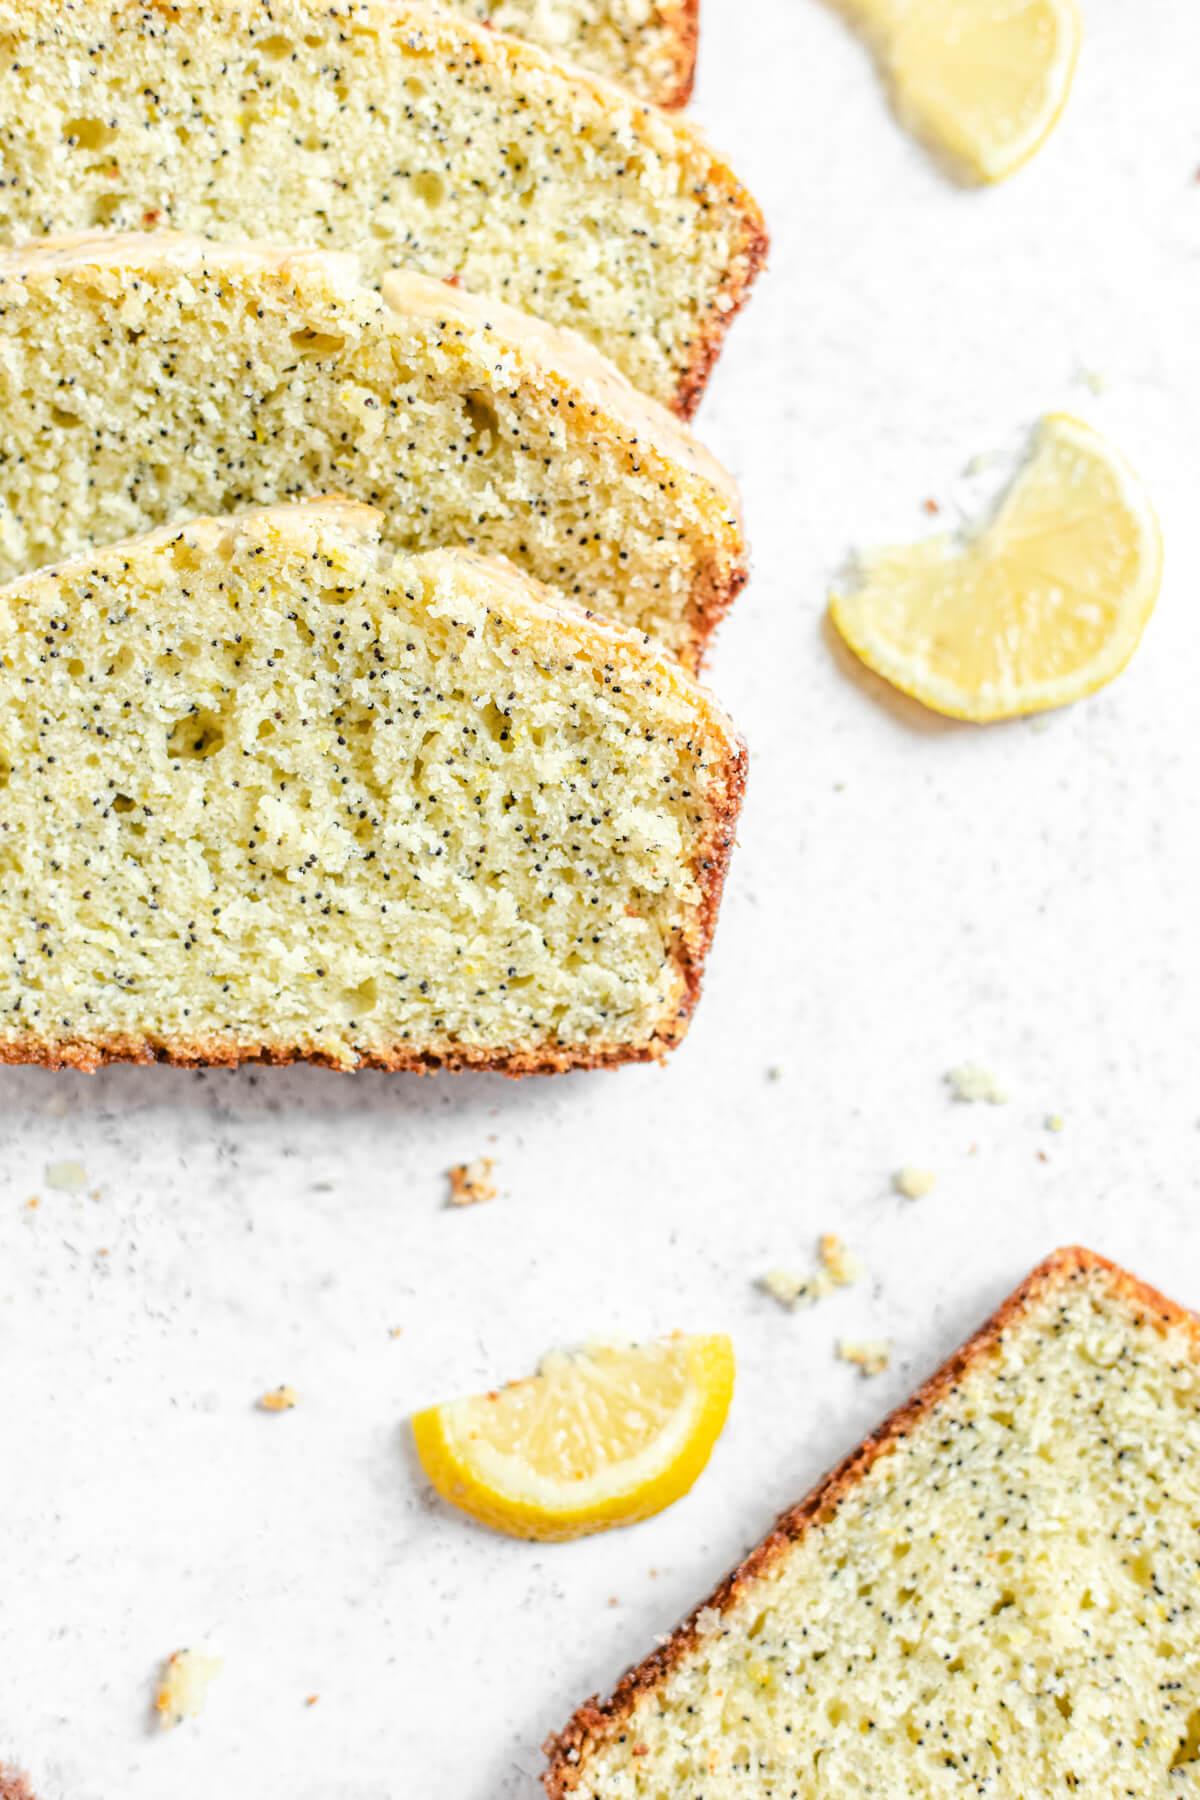 slices of loaf with lemon slices beside them